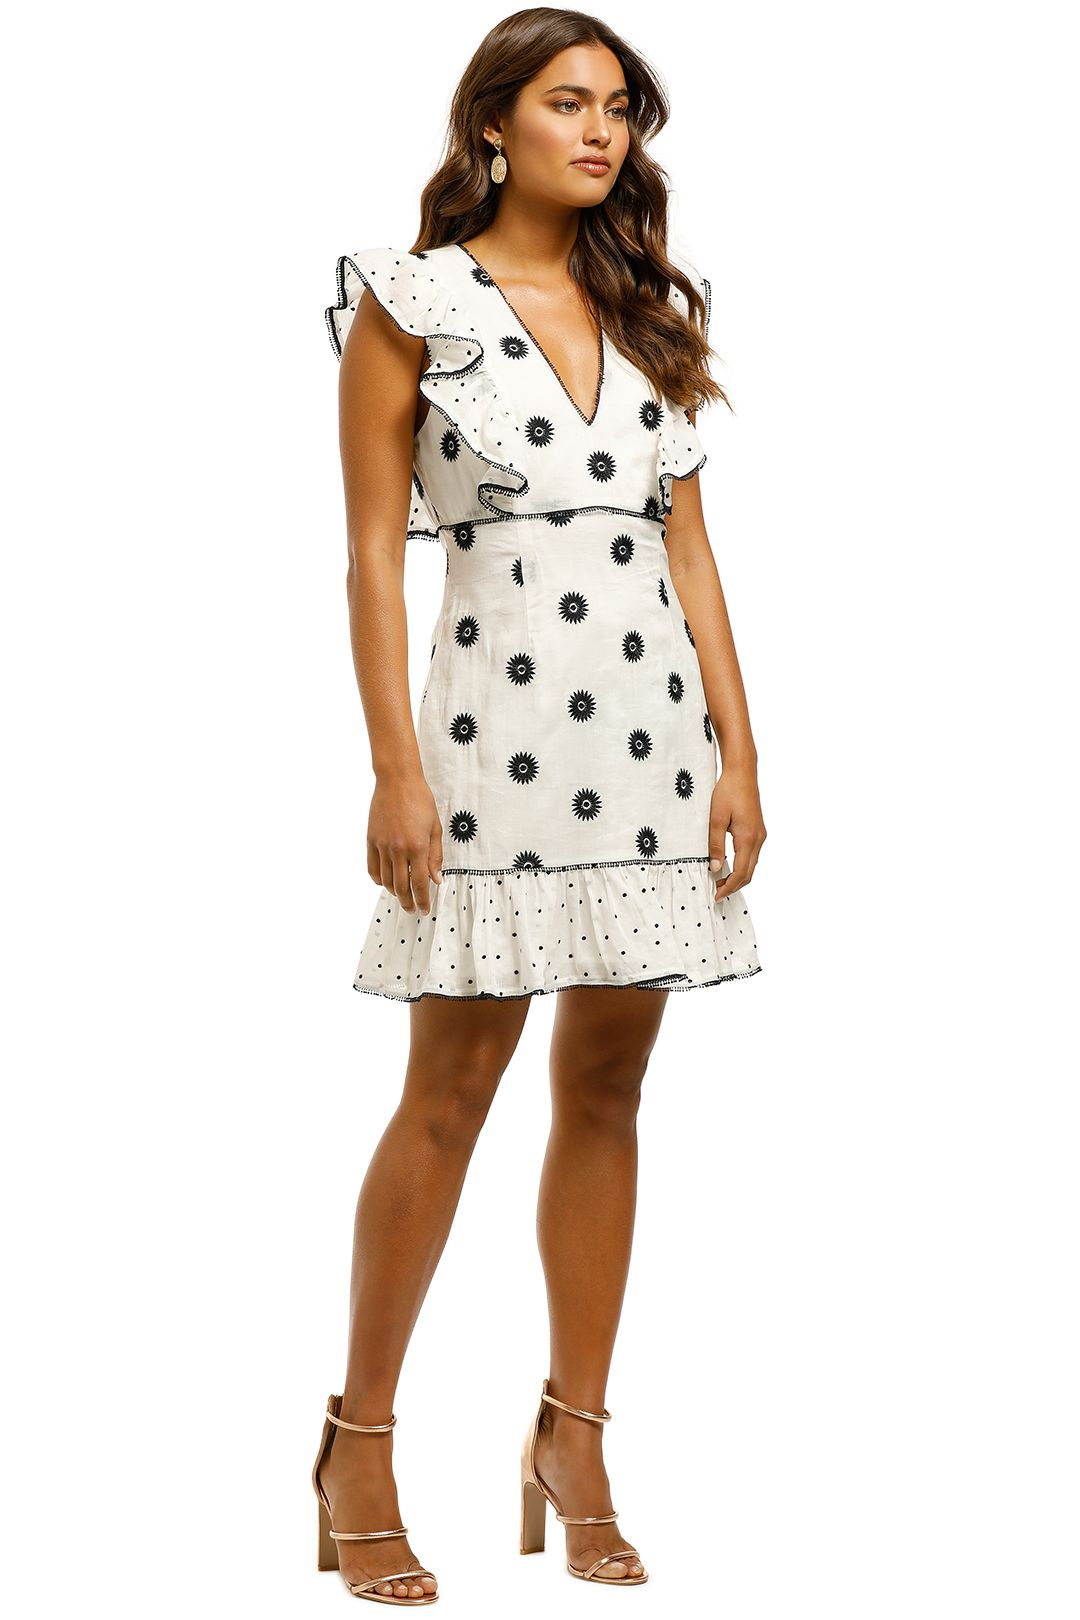 Talulah-Whimsical-Mini-Dress-Morning-Daisy-Side